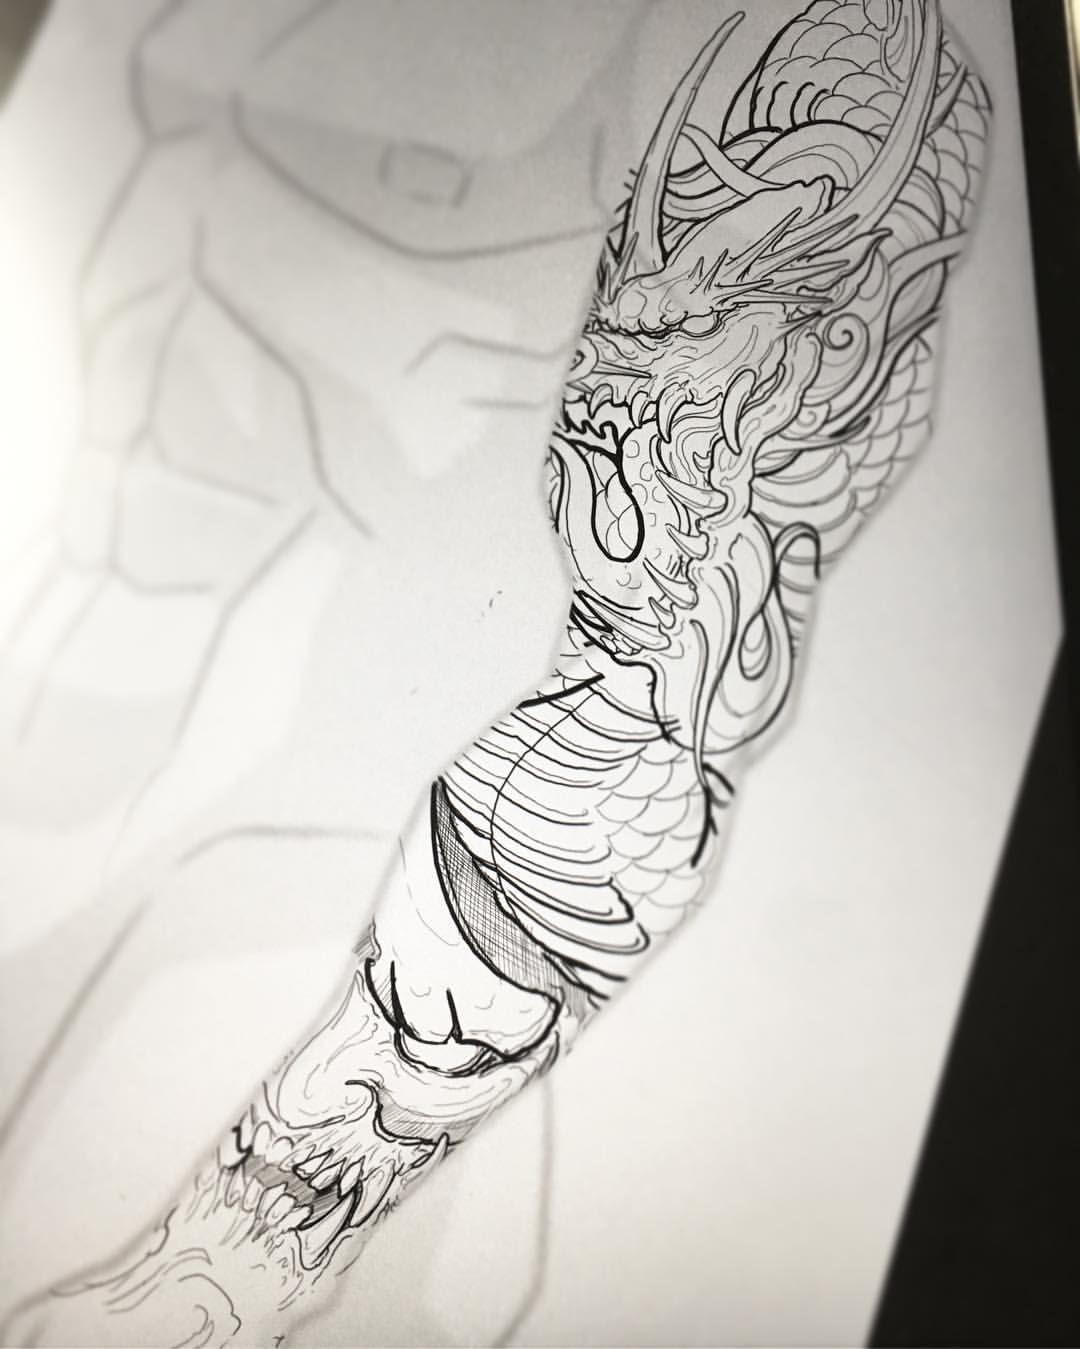 Chronic Ink Tattoo Kitsilano Vancouver Asian Tattoos Ed Truong Hannya Dragon Tatuirovki Rukava Izredzumi Tatuirovki Samurajskoe Tatu